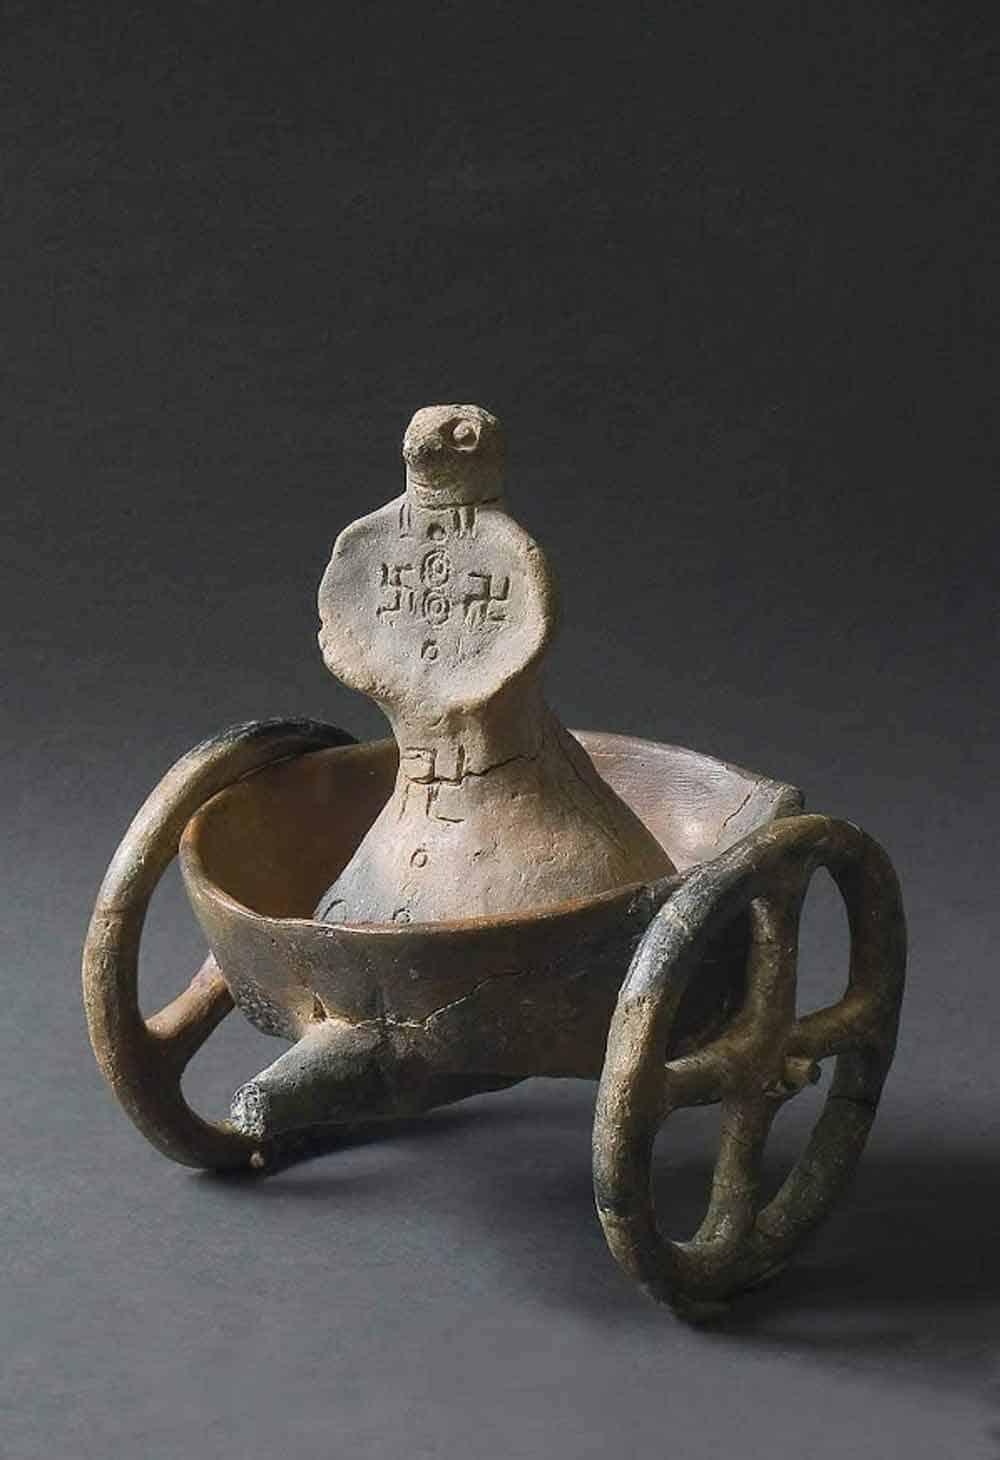 Motiv sa vozačkih dozvola: Dupljajska kolica iz Gradskog muzeja u Vršcu